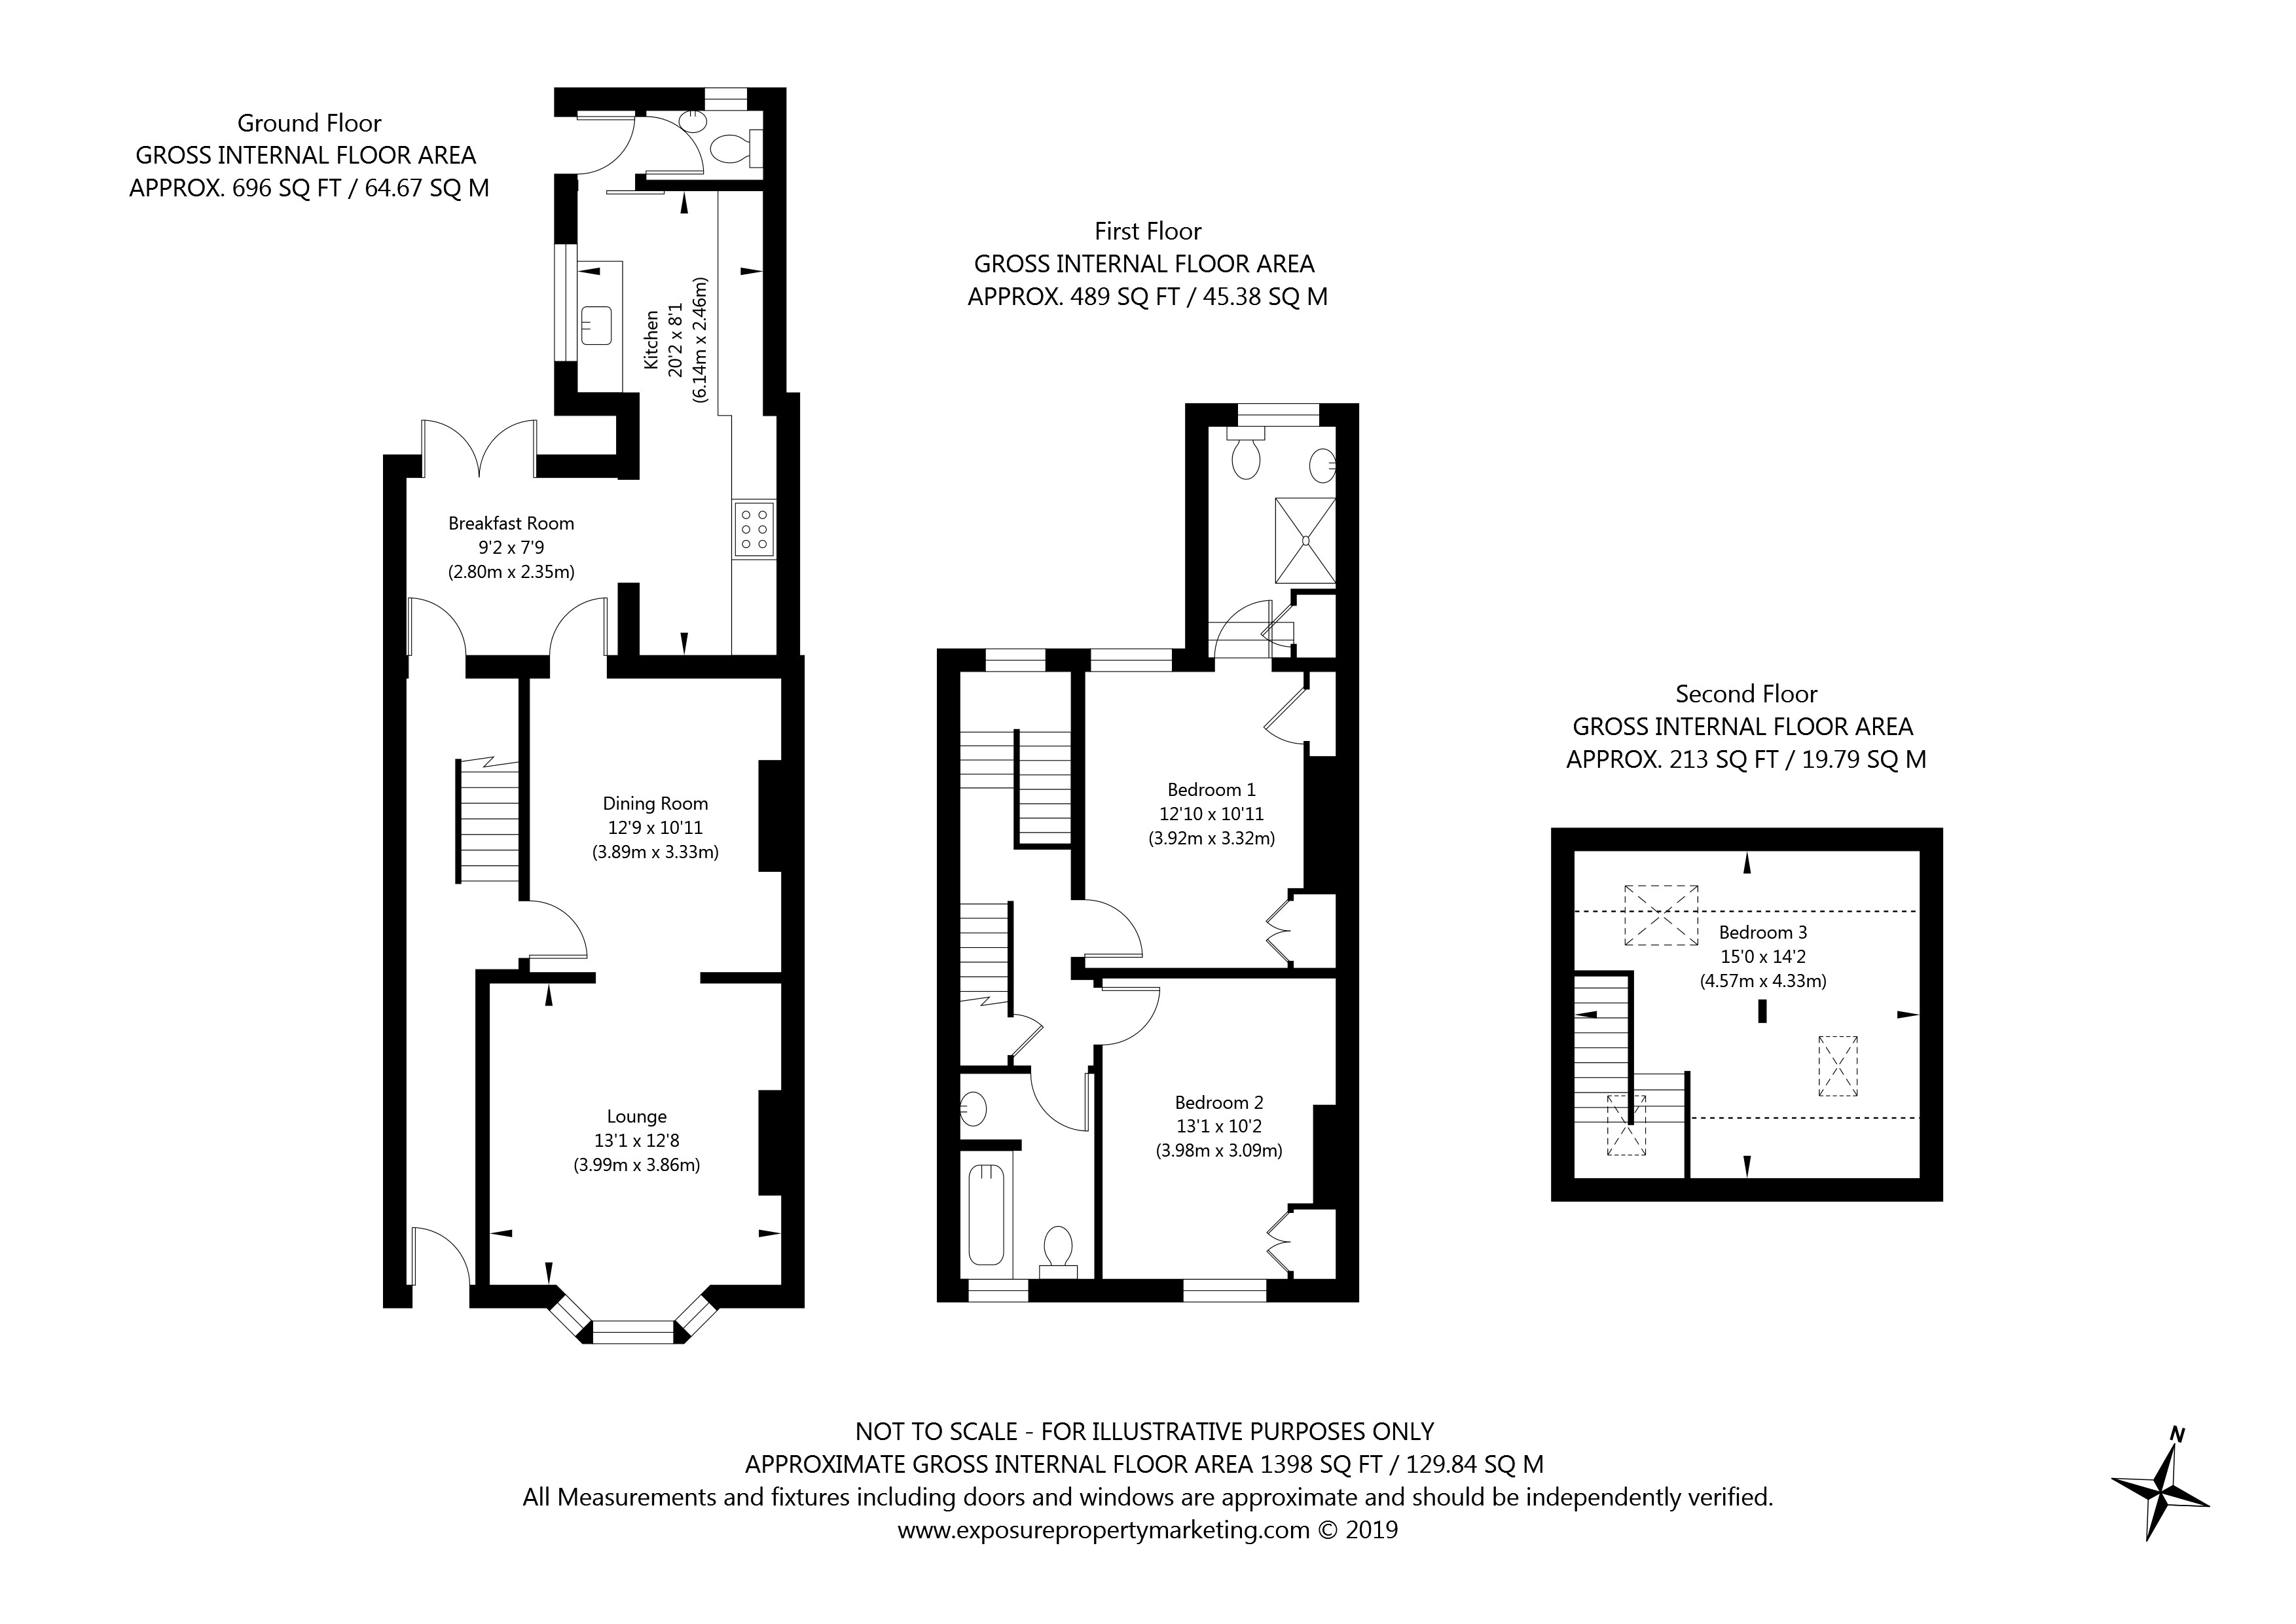 127 East Parade, York property floorplan